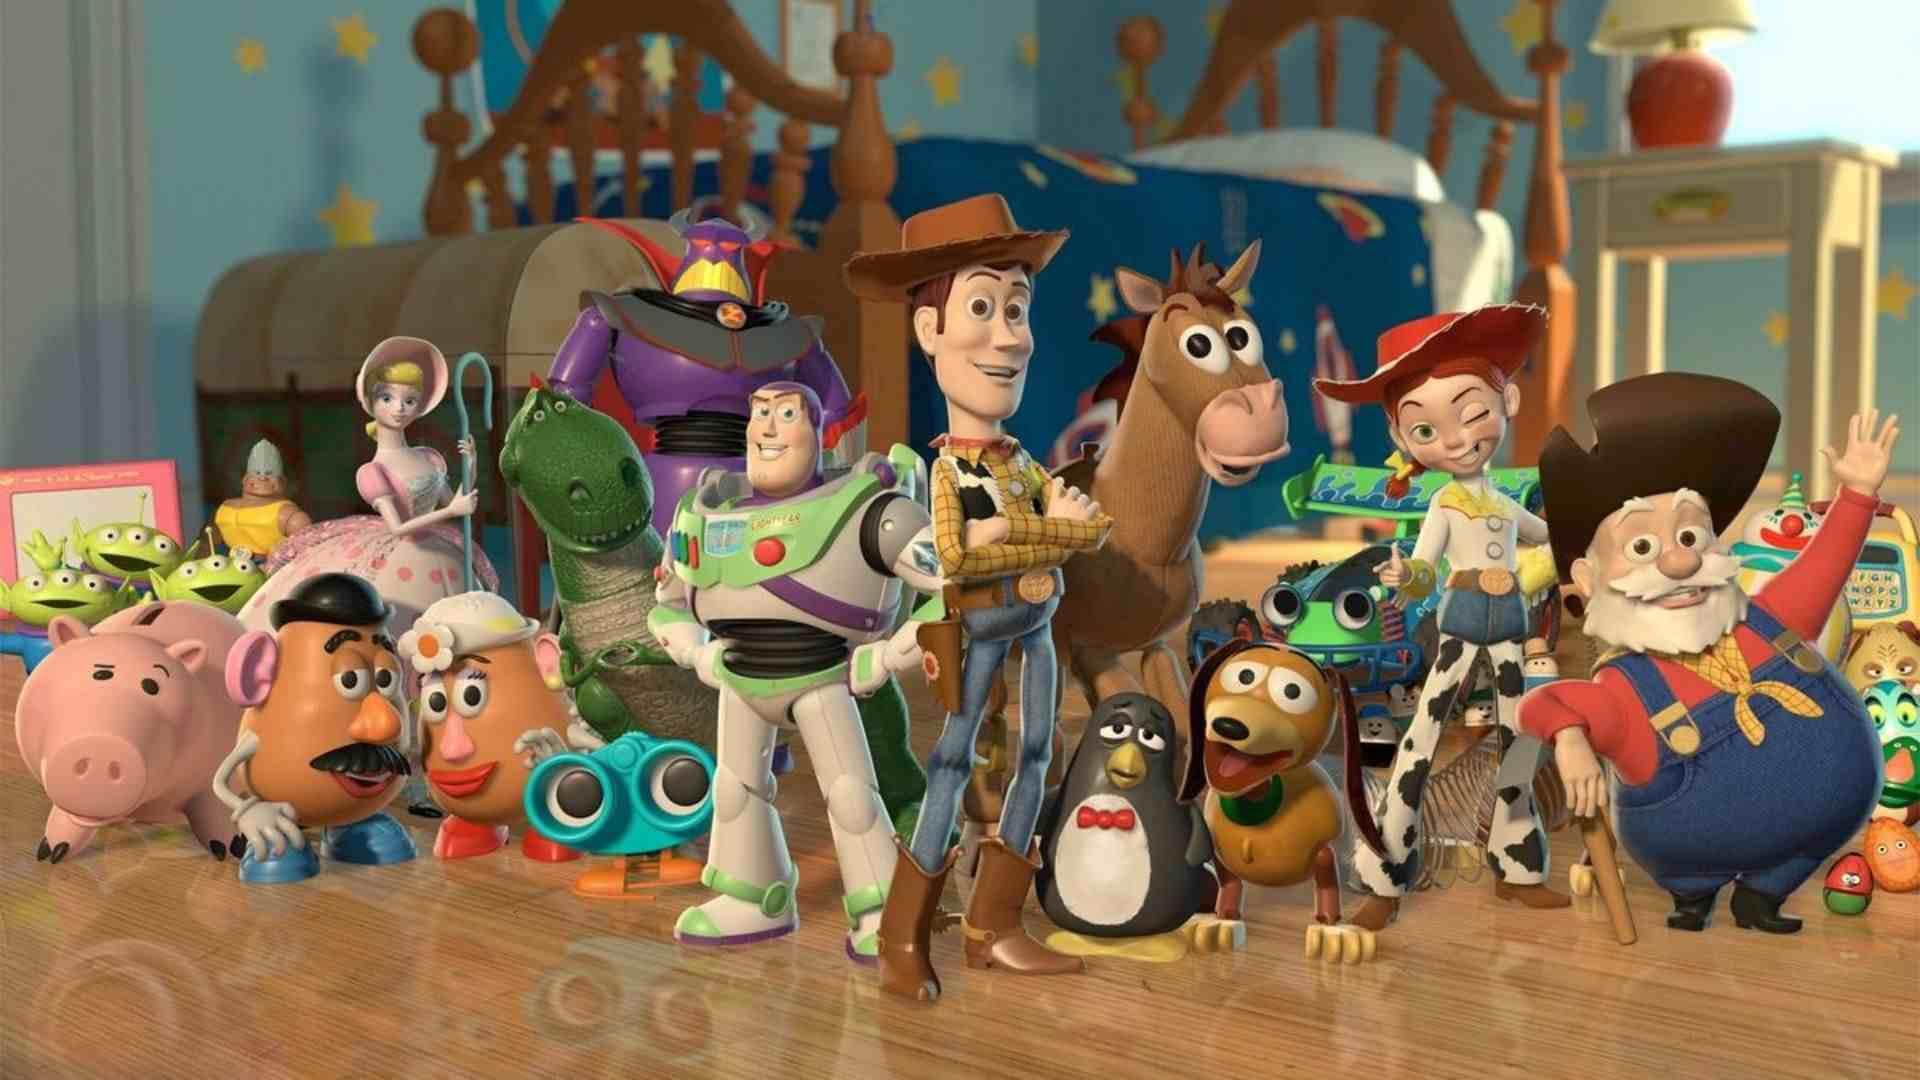 Toy story 2 (1999) - Disney Pixar's Soul article